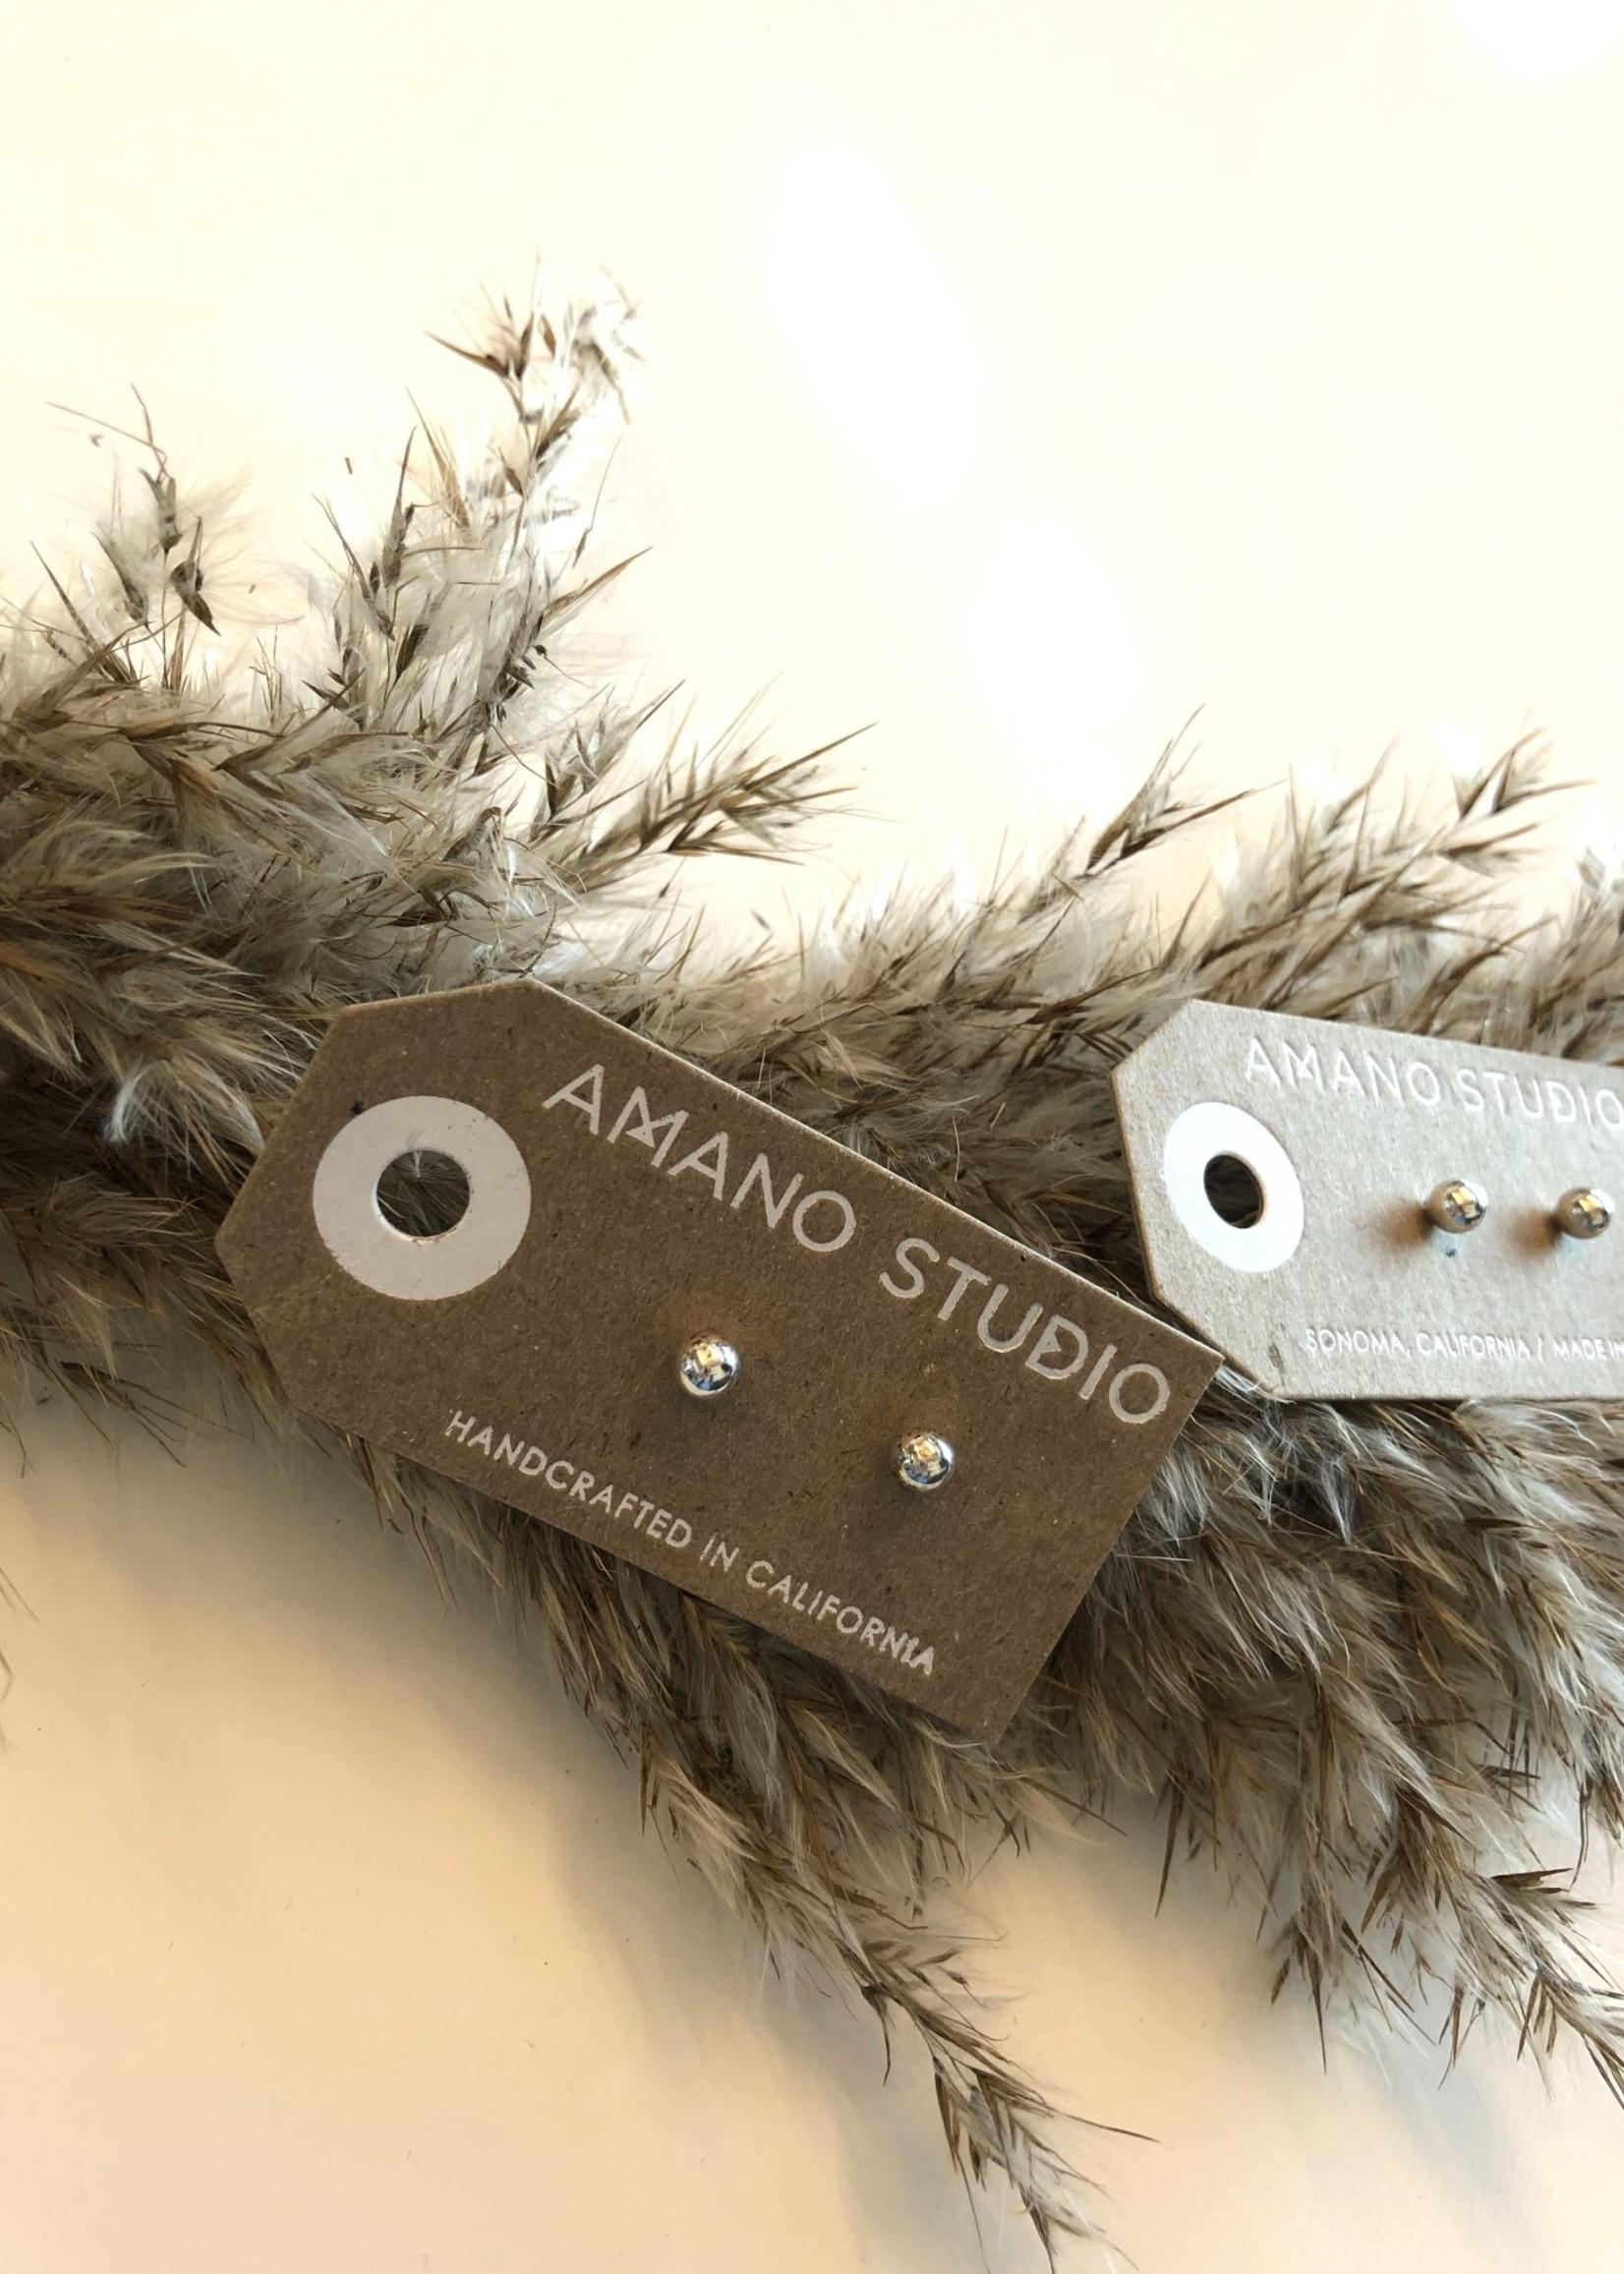 AMANO studio Ball Studs STERLING SILVER